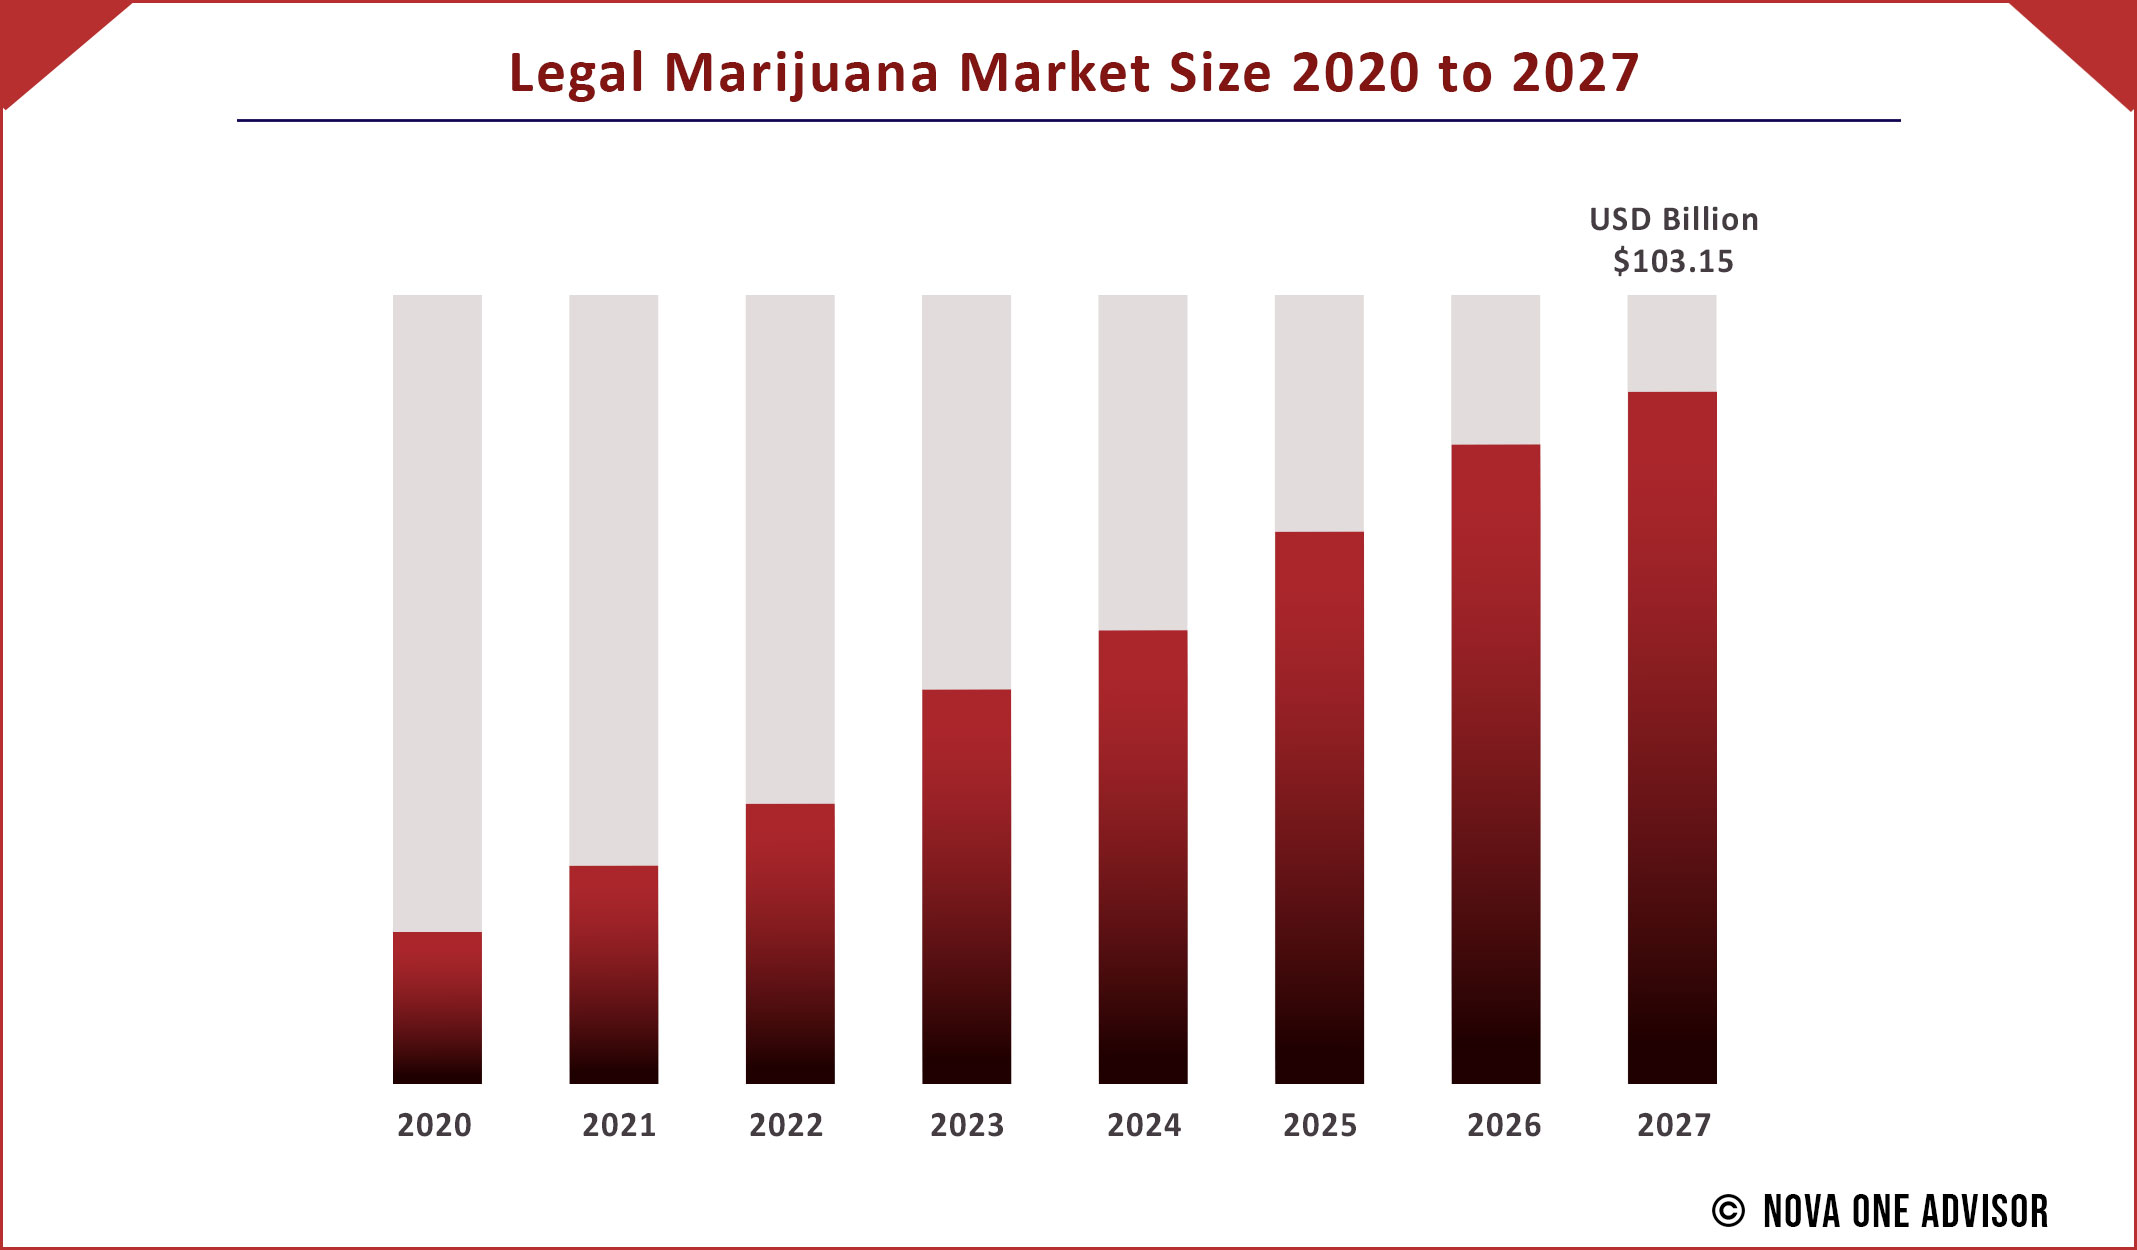 Legal Marijuana Market Size 2020 to 2027